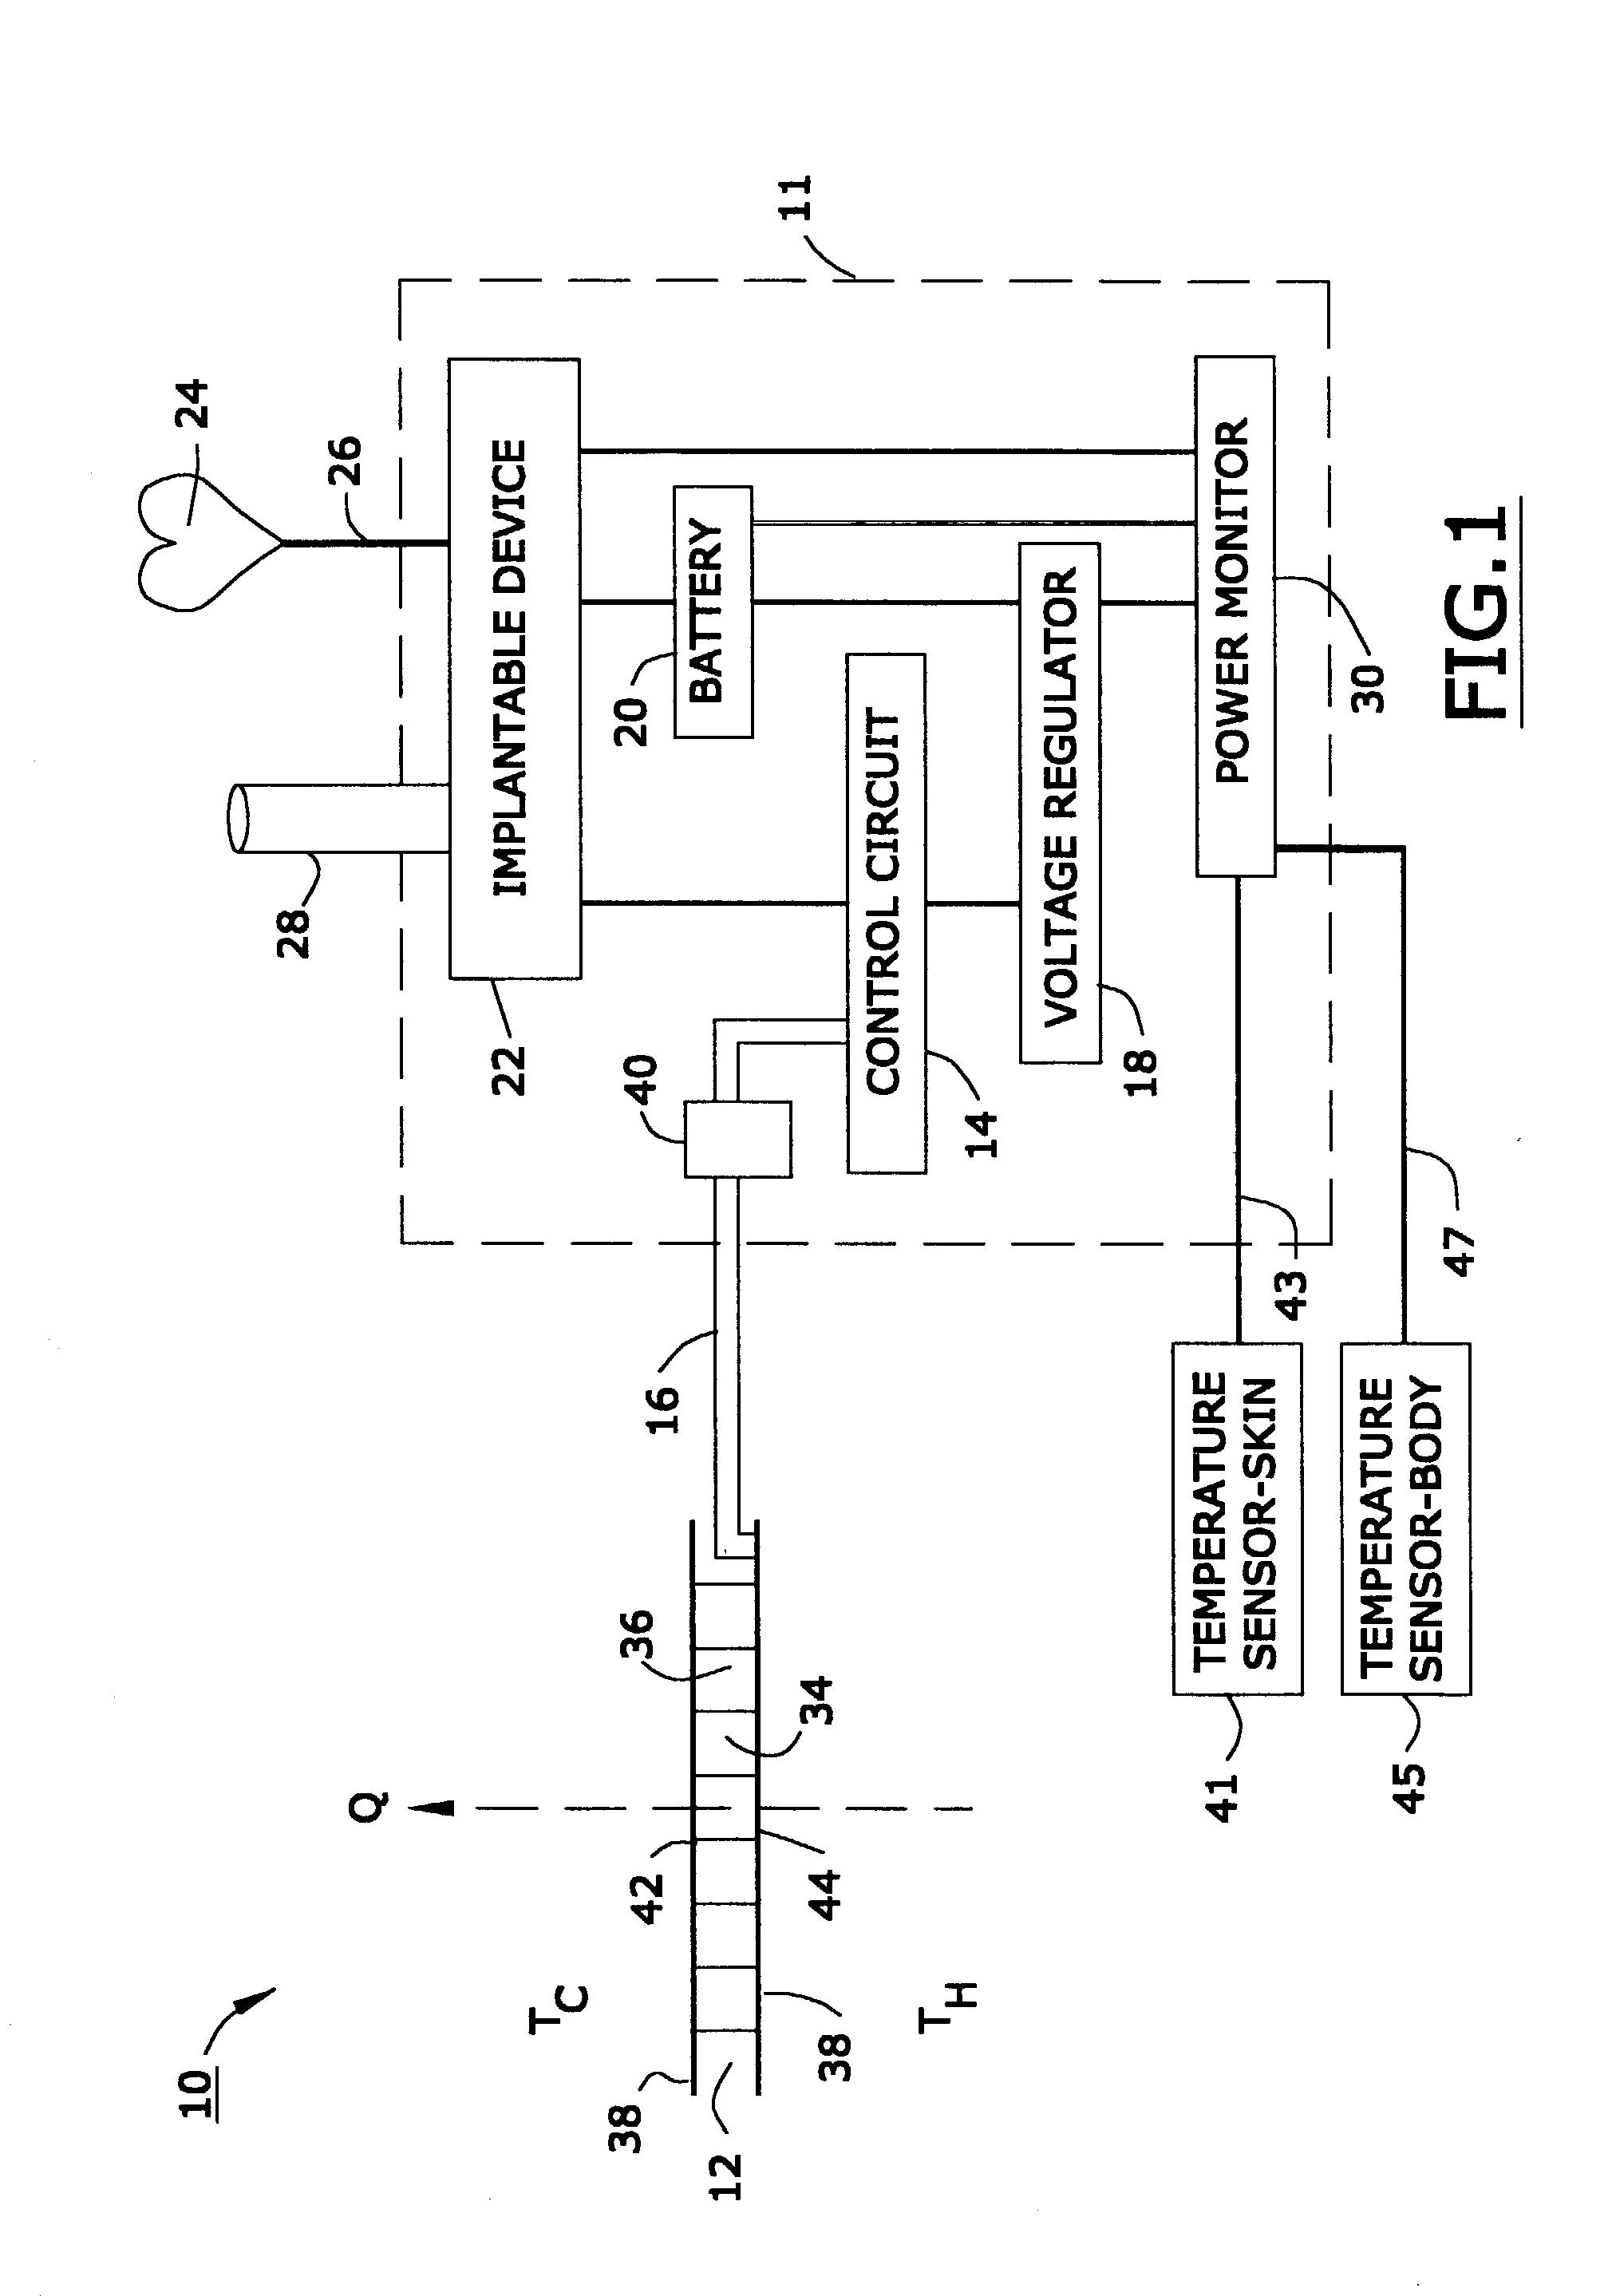 Regulator Circuit Diagram Tradeoficcom Data Battery Backup Strobing Led Display Wire Schema U2022 Rh Mobilcasino Pw Linear Variable Voltage Pneumatic